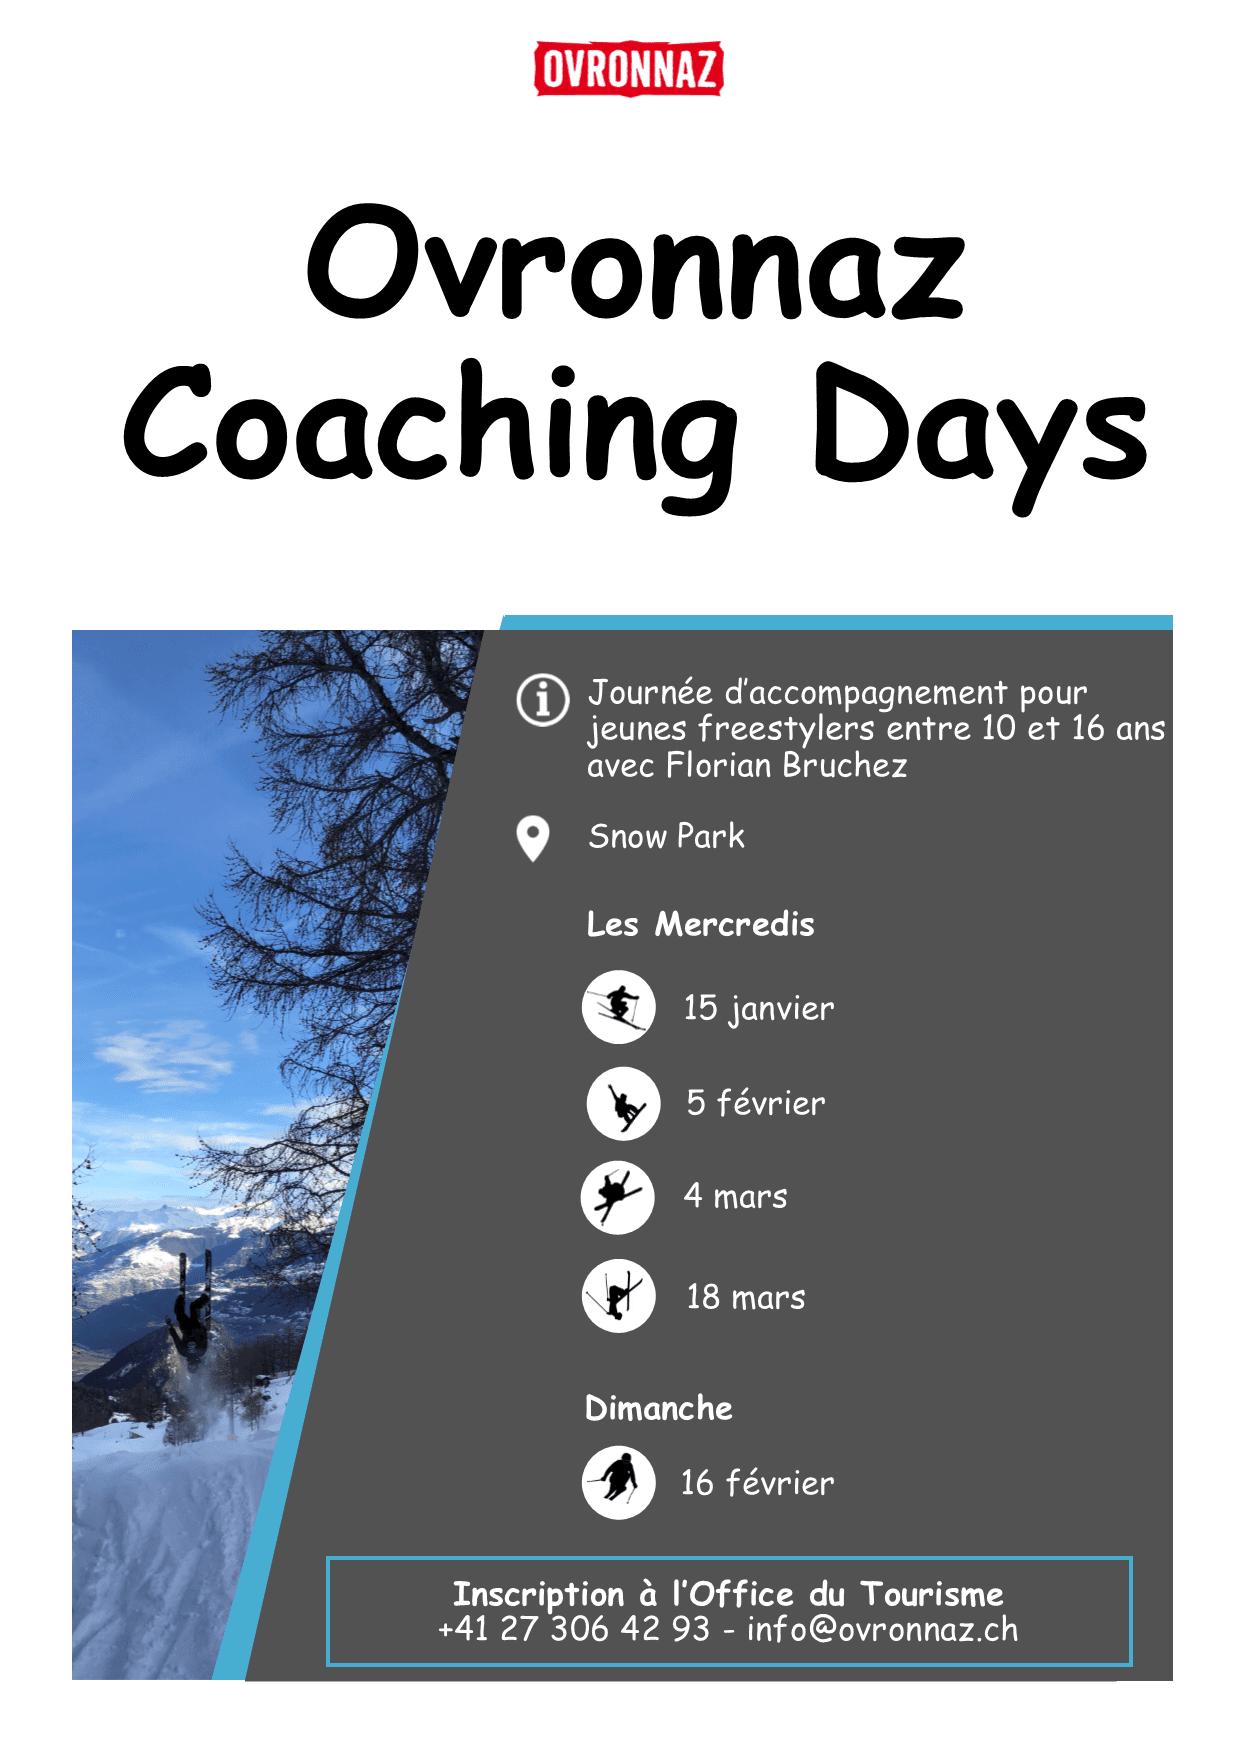 OVZ Coaching Days